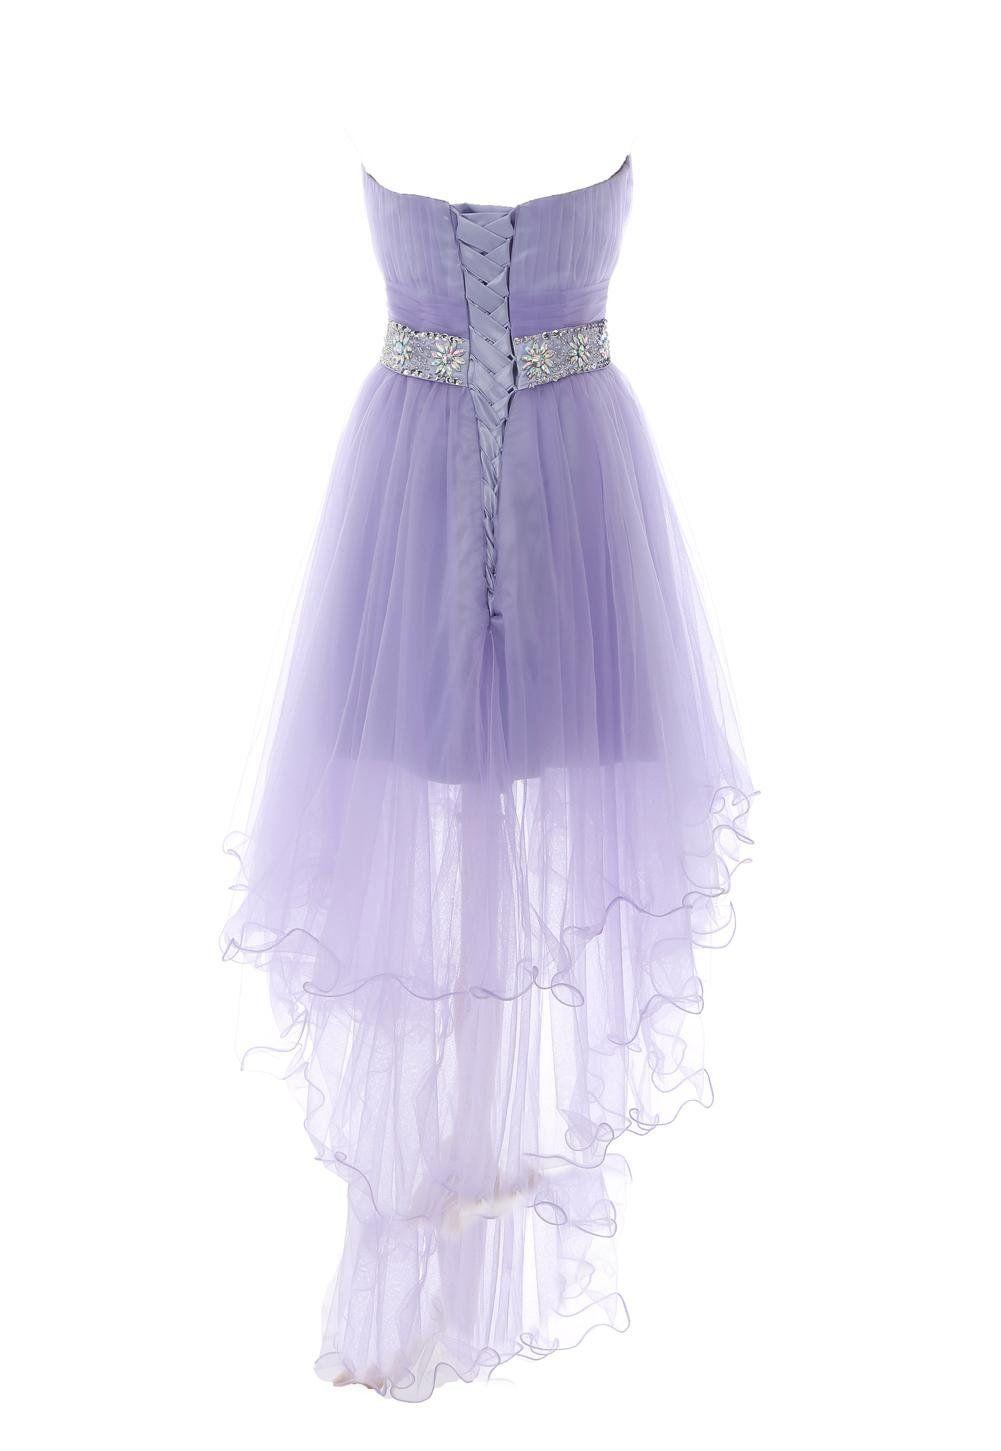 Amazoncom Yiyadawn Womens High Low Homecoming Dress Short Evening